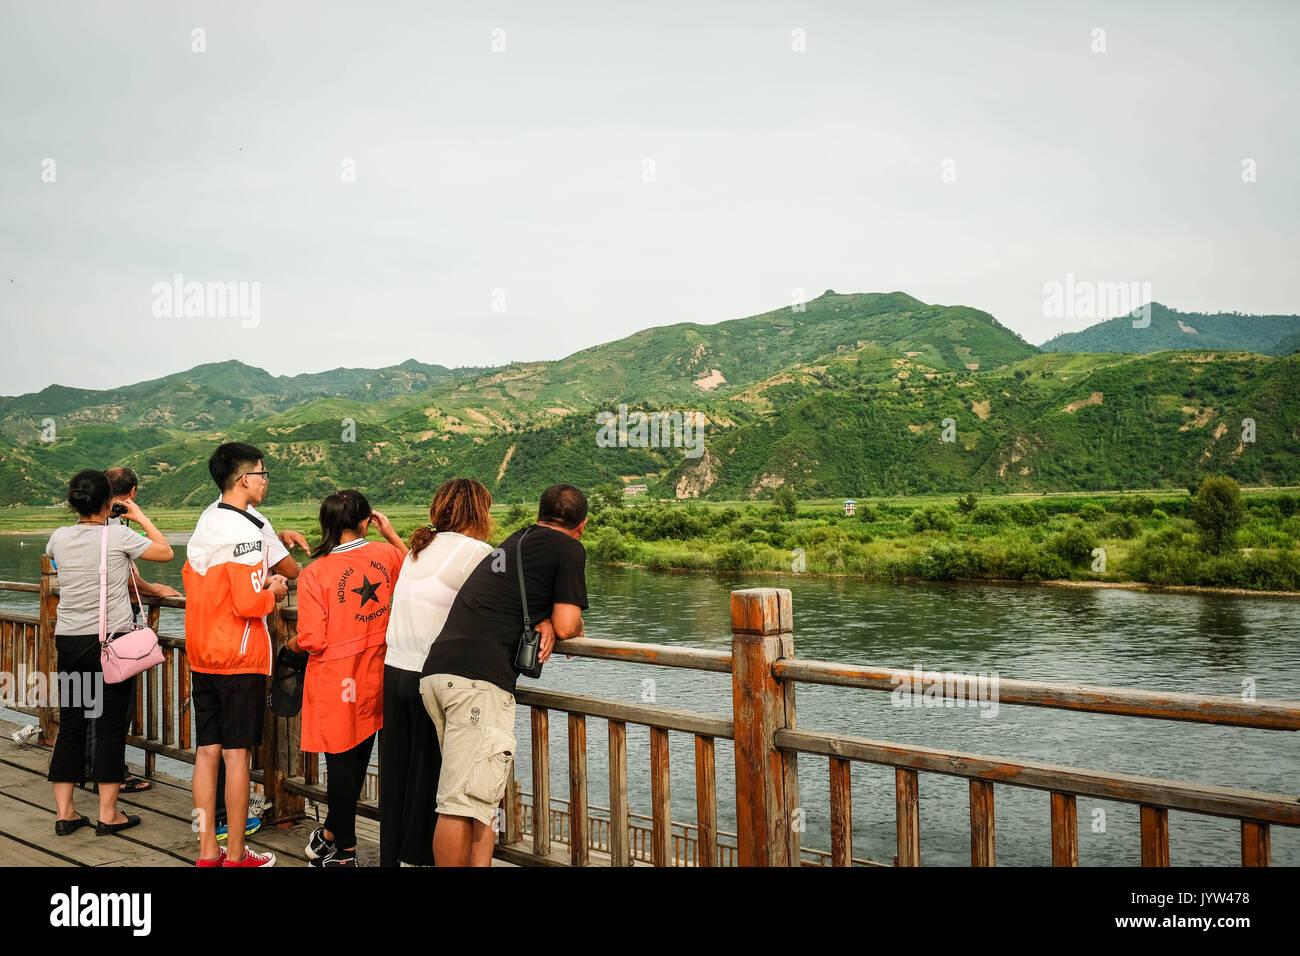 Jilin And China Stock Photos & Jilin And China Stock ...